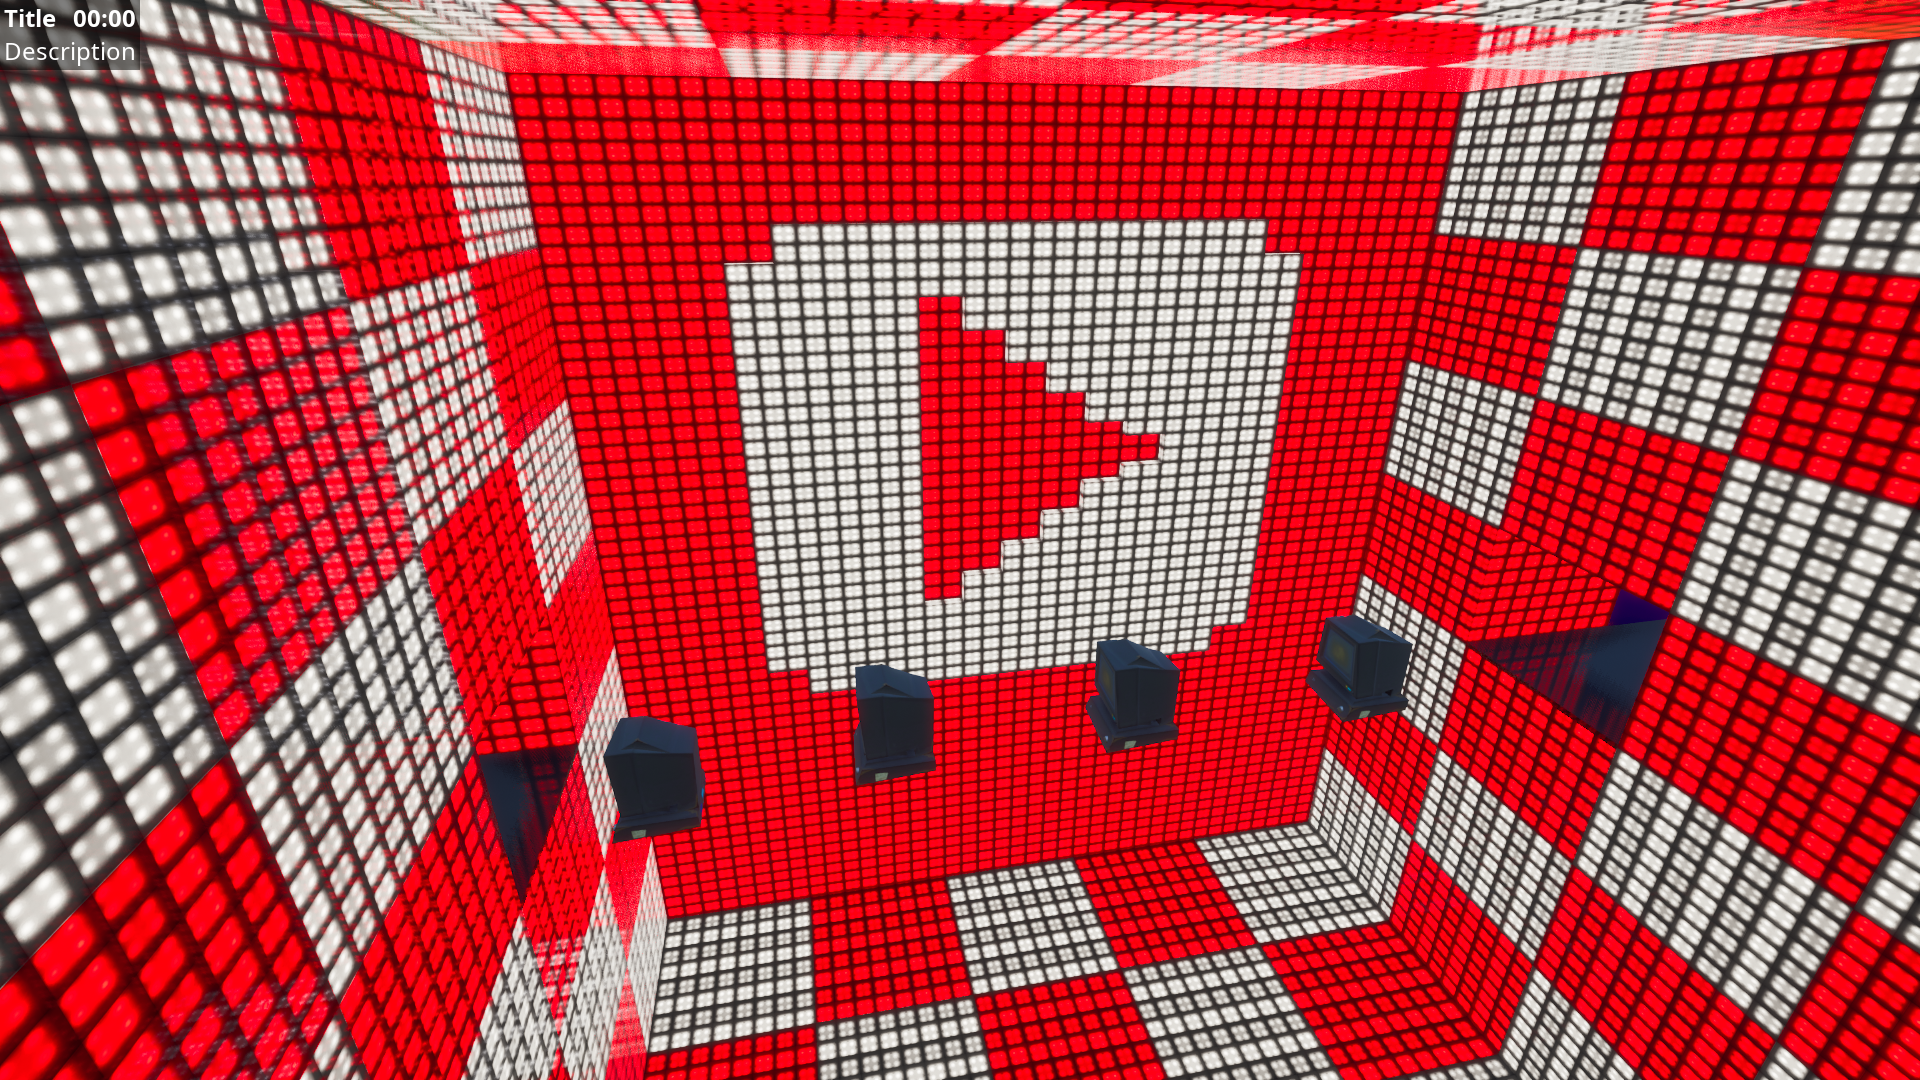 Youtube Pixel Art Logo